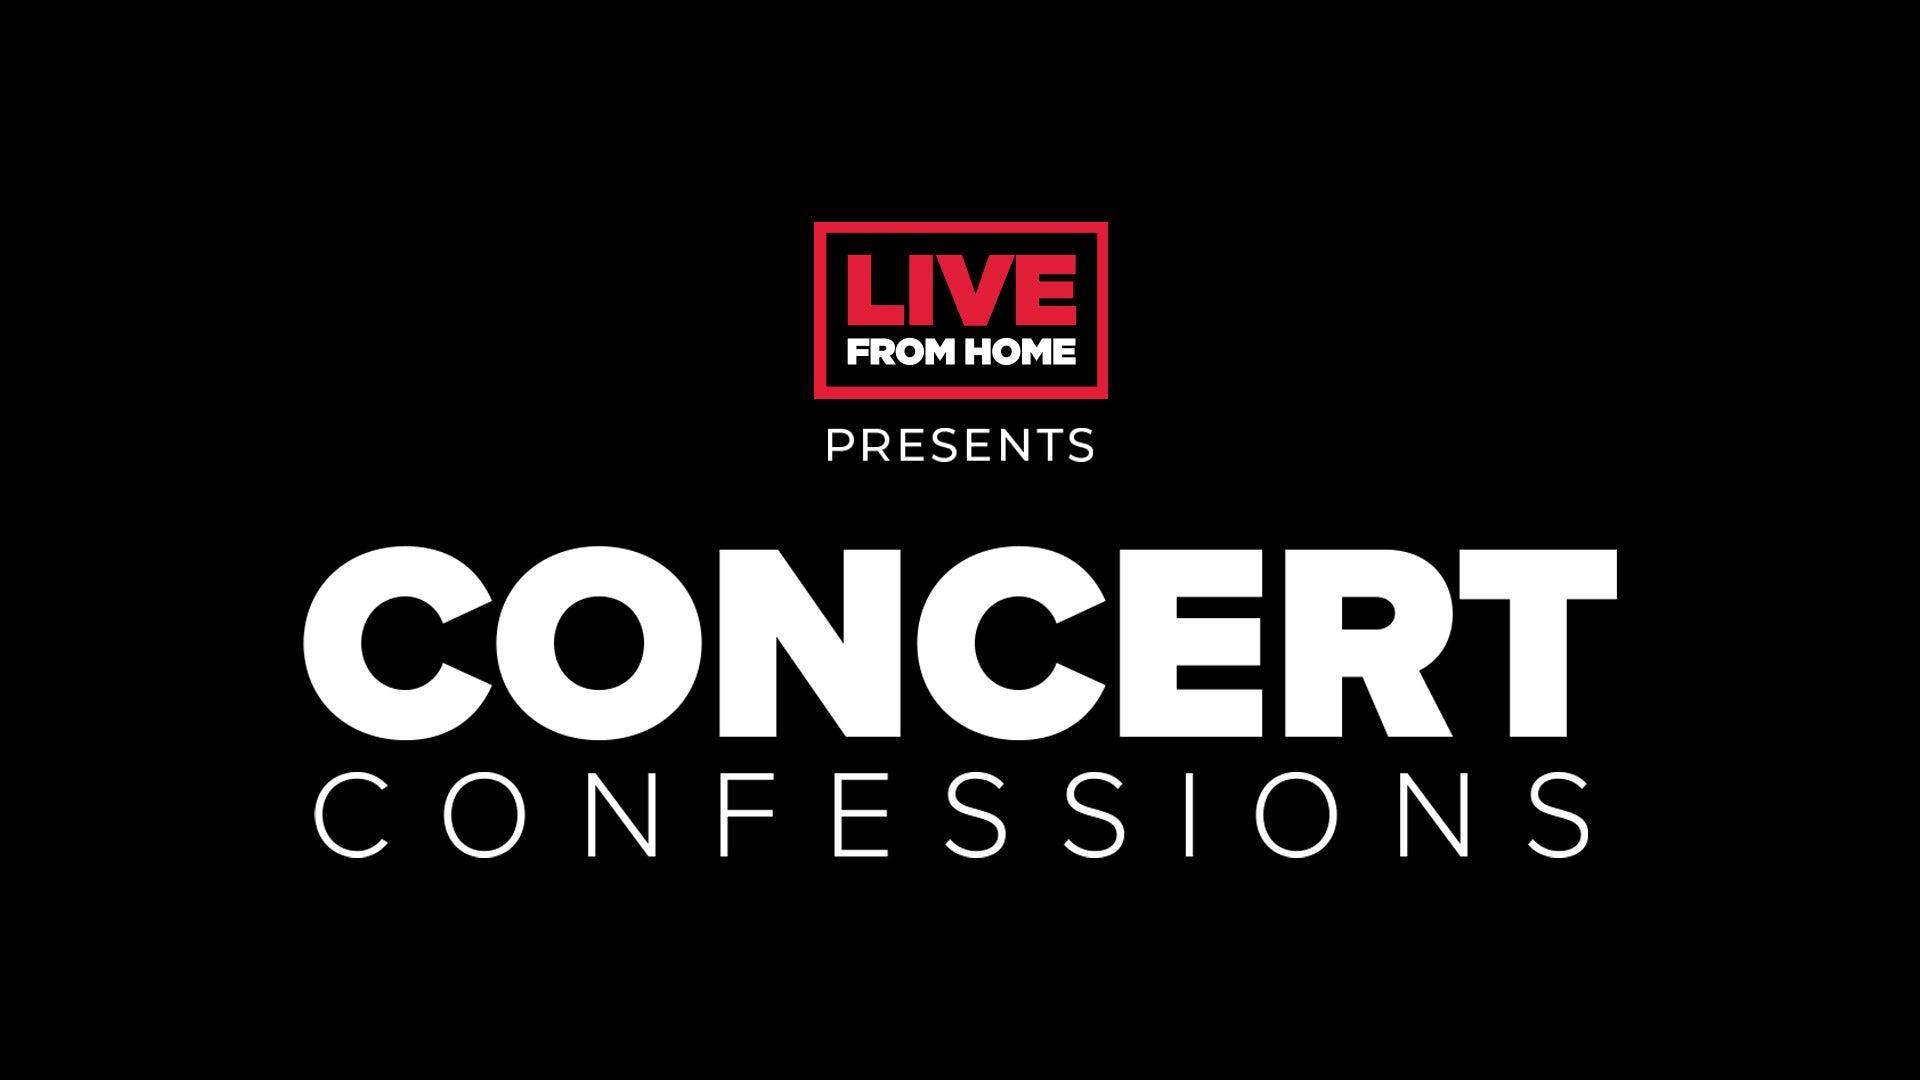 Concert Confessions